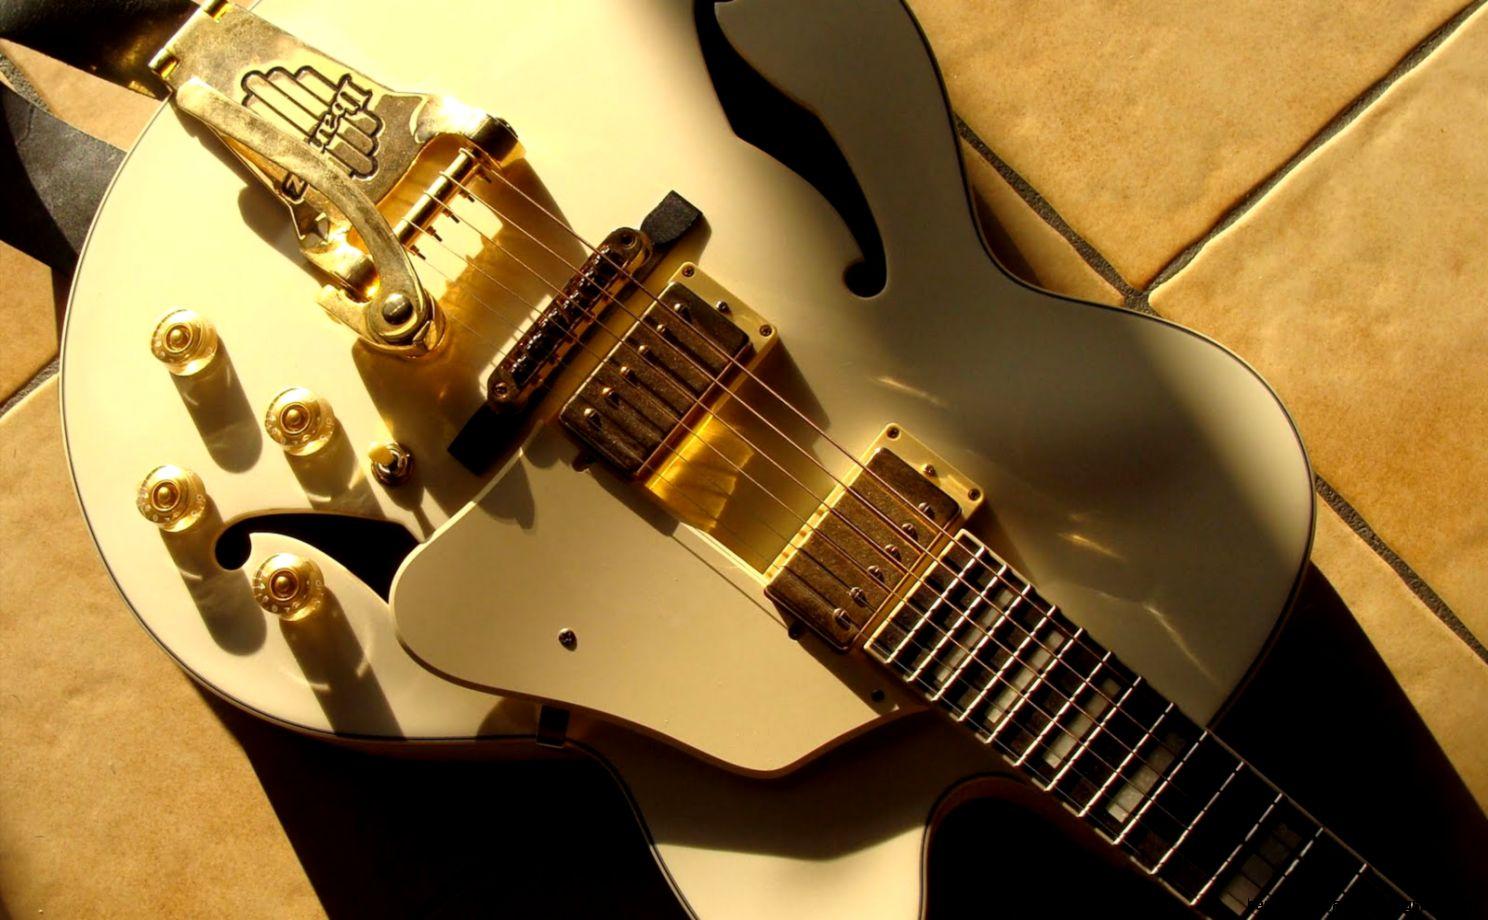 Ibanez Guitar Wallpaper: Ibanez Electric Guitar Hd Wallpaper Background